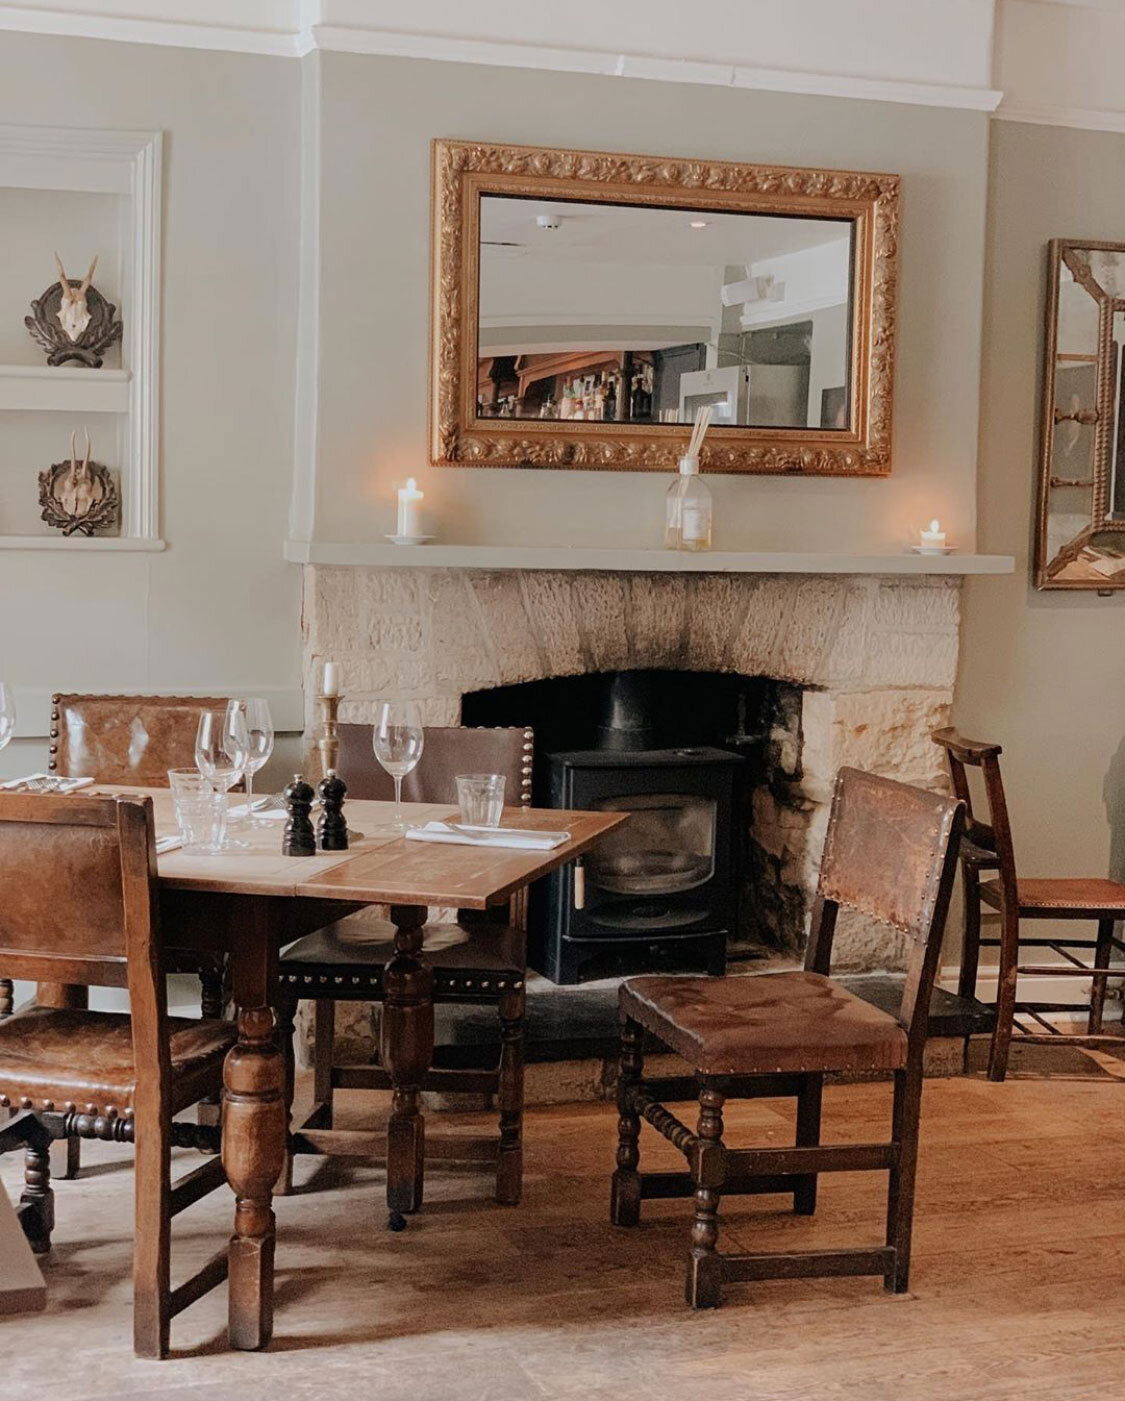 Places: The Wheatsheaf Inn, Northleach